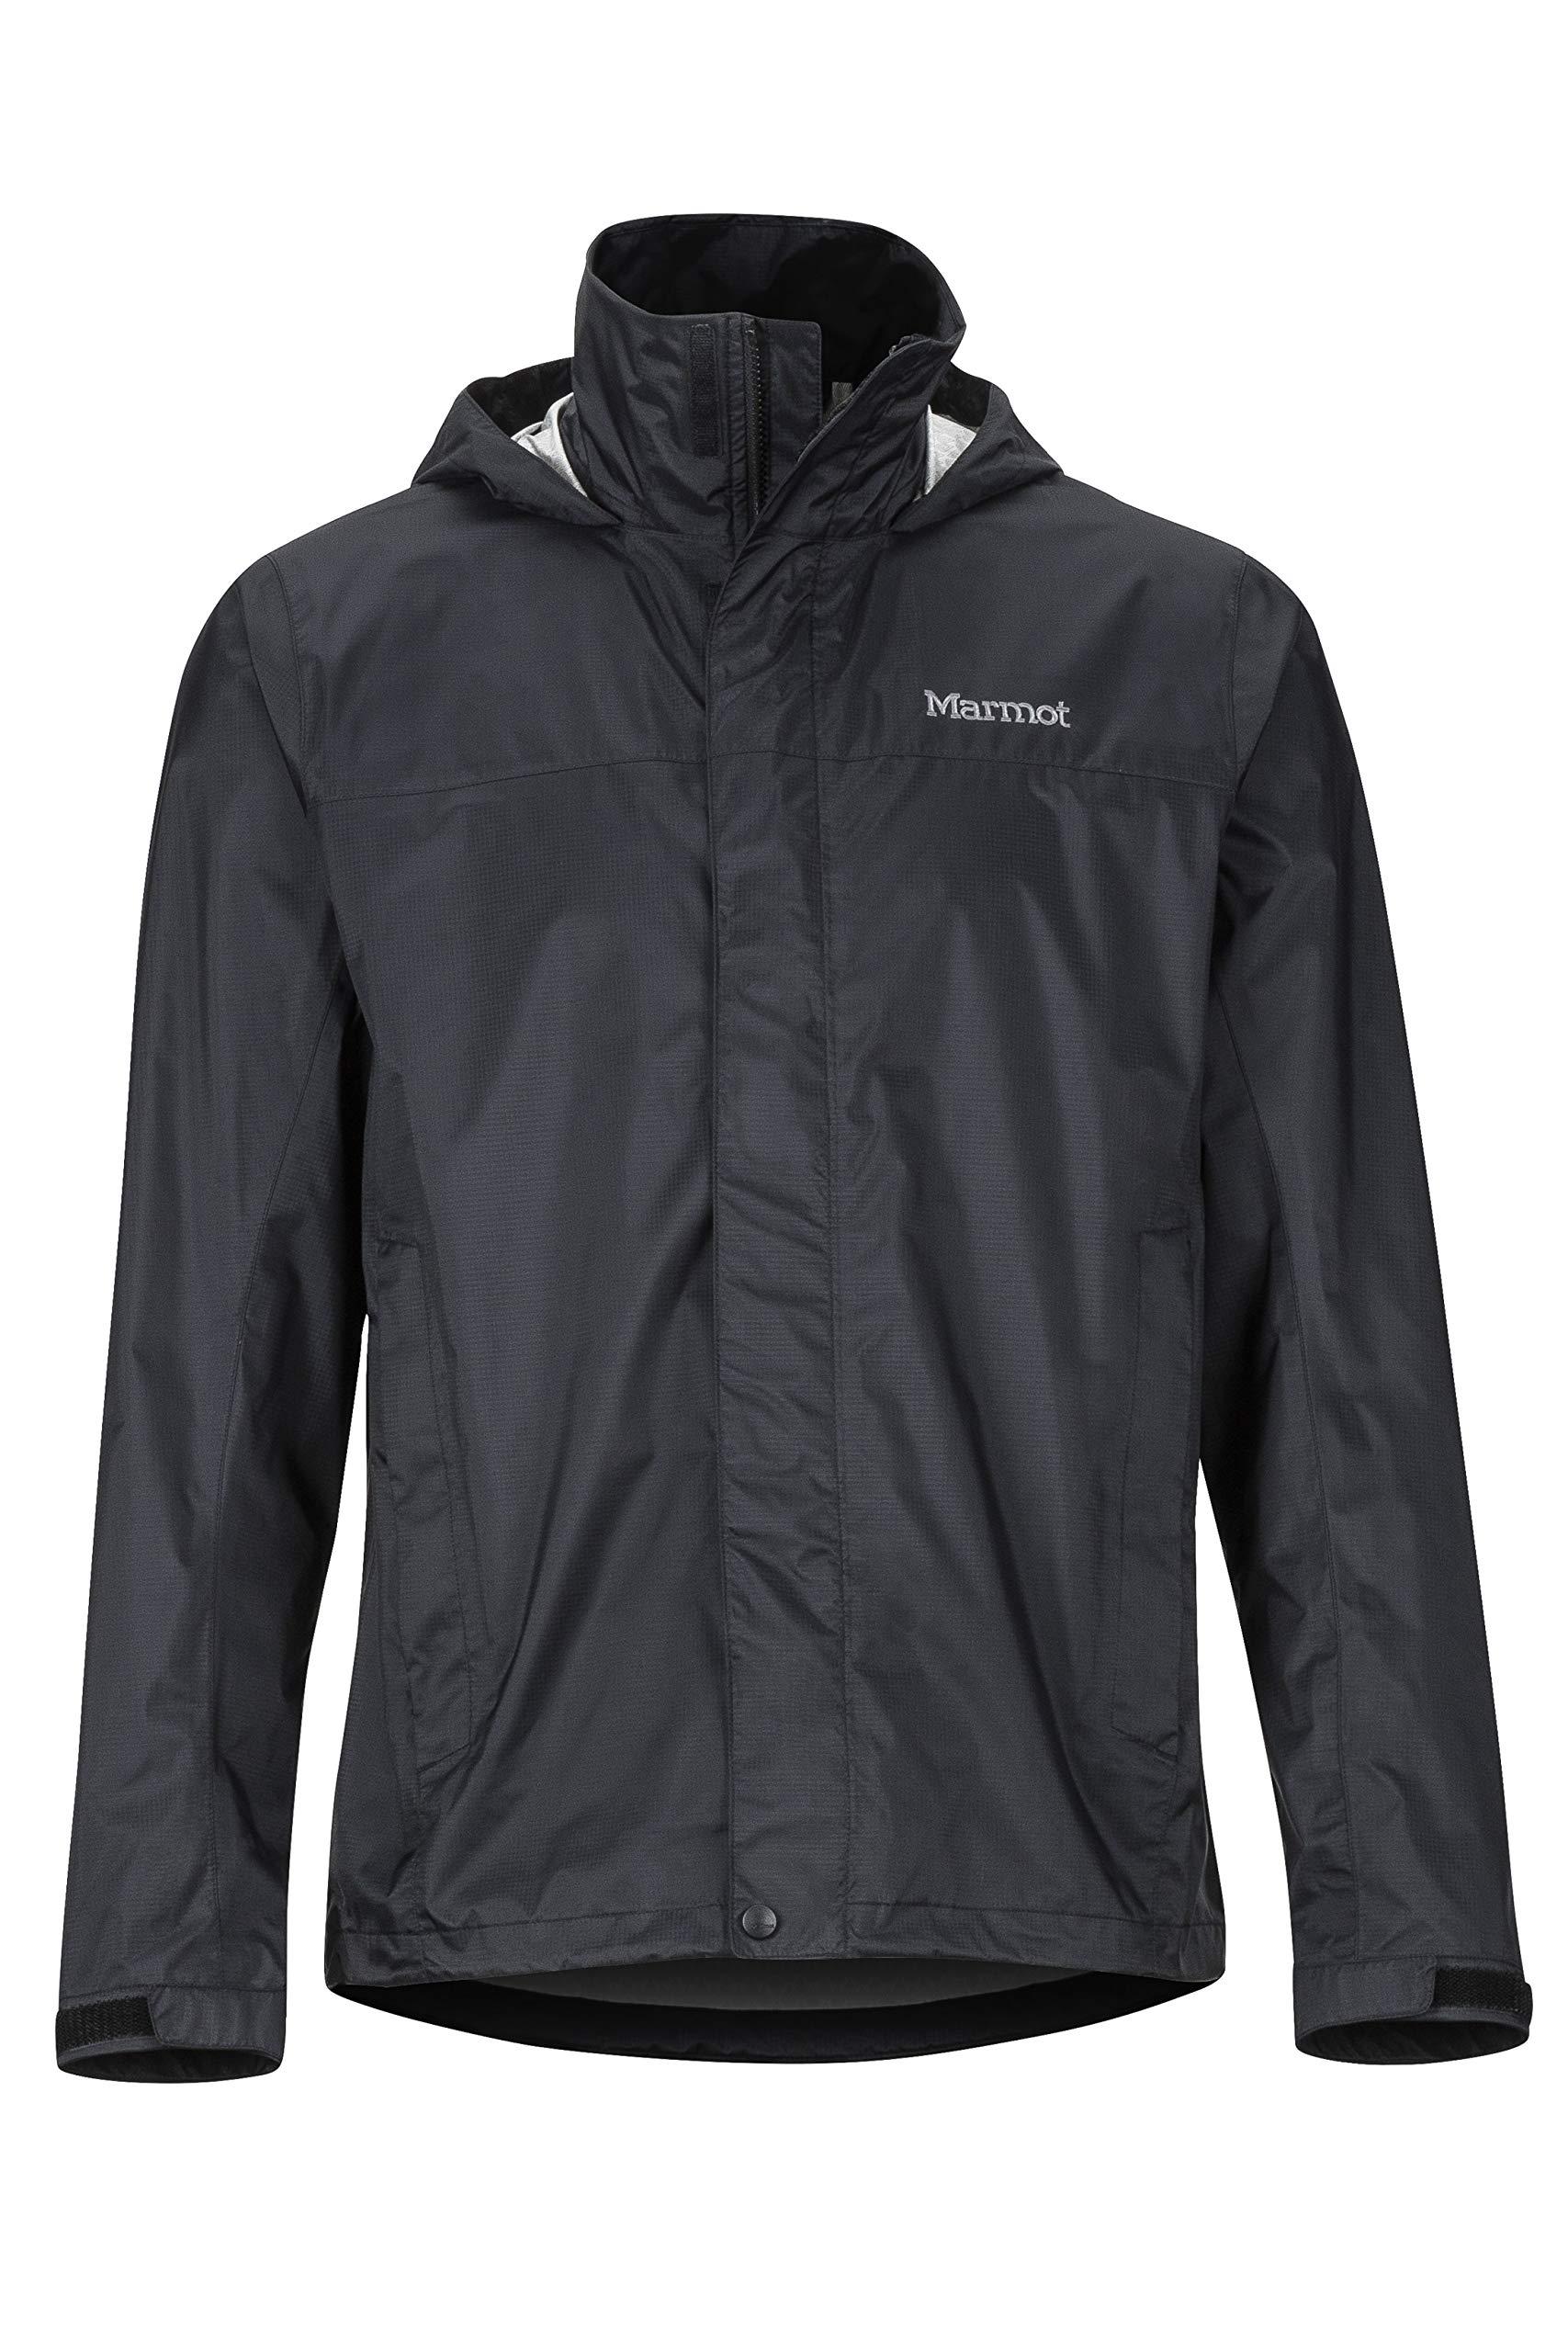 Marmot Men's PreCip Eco Jacket by Marmot